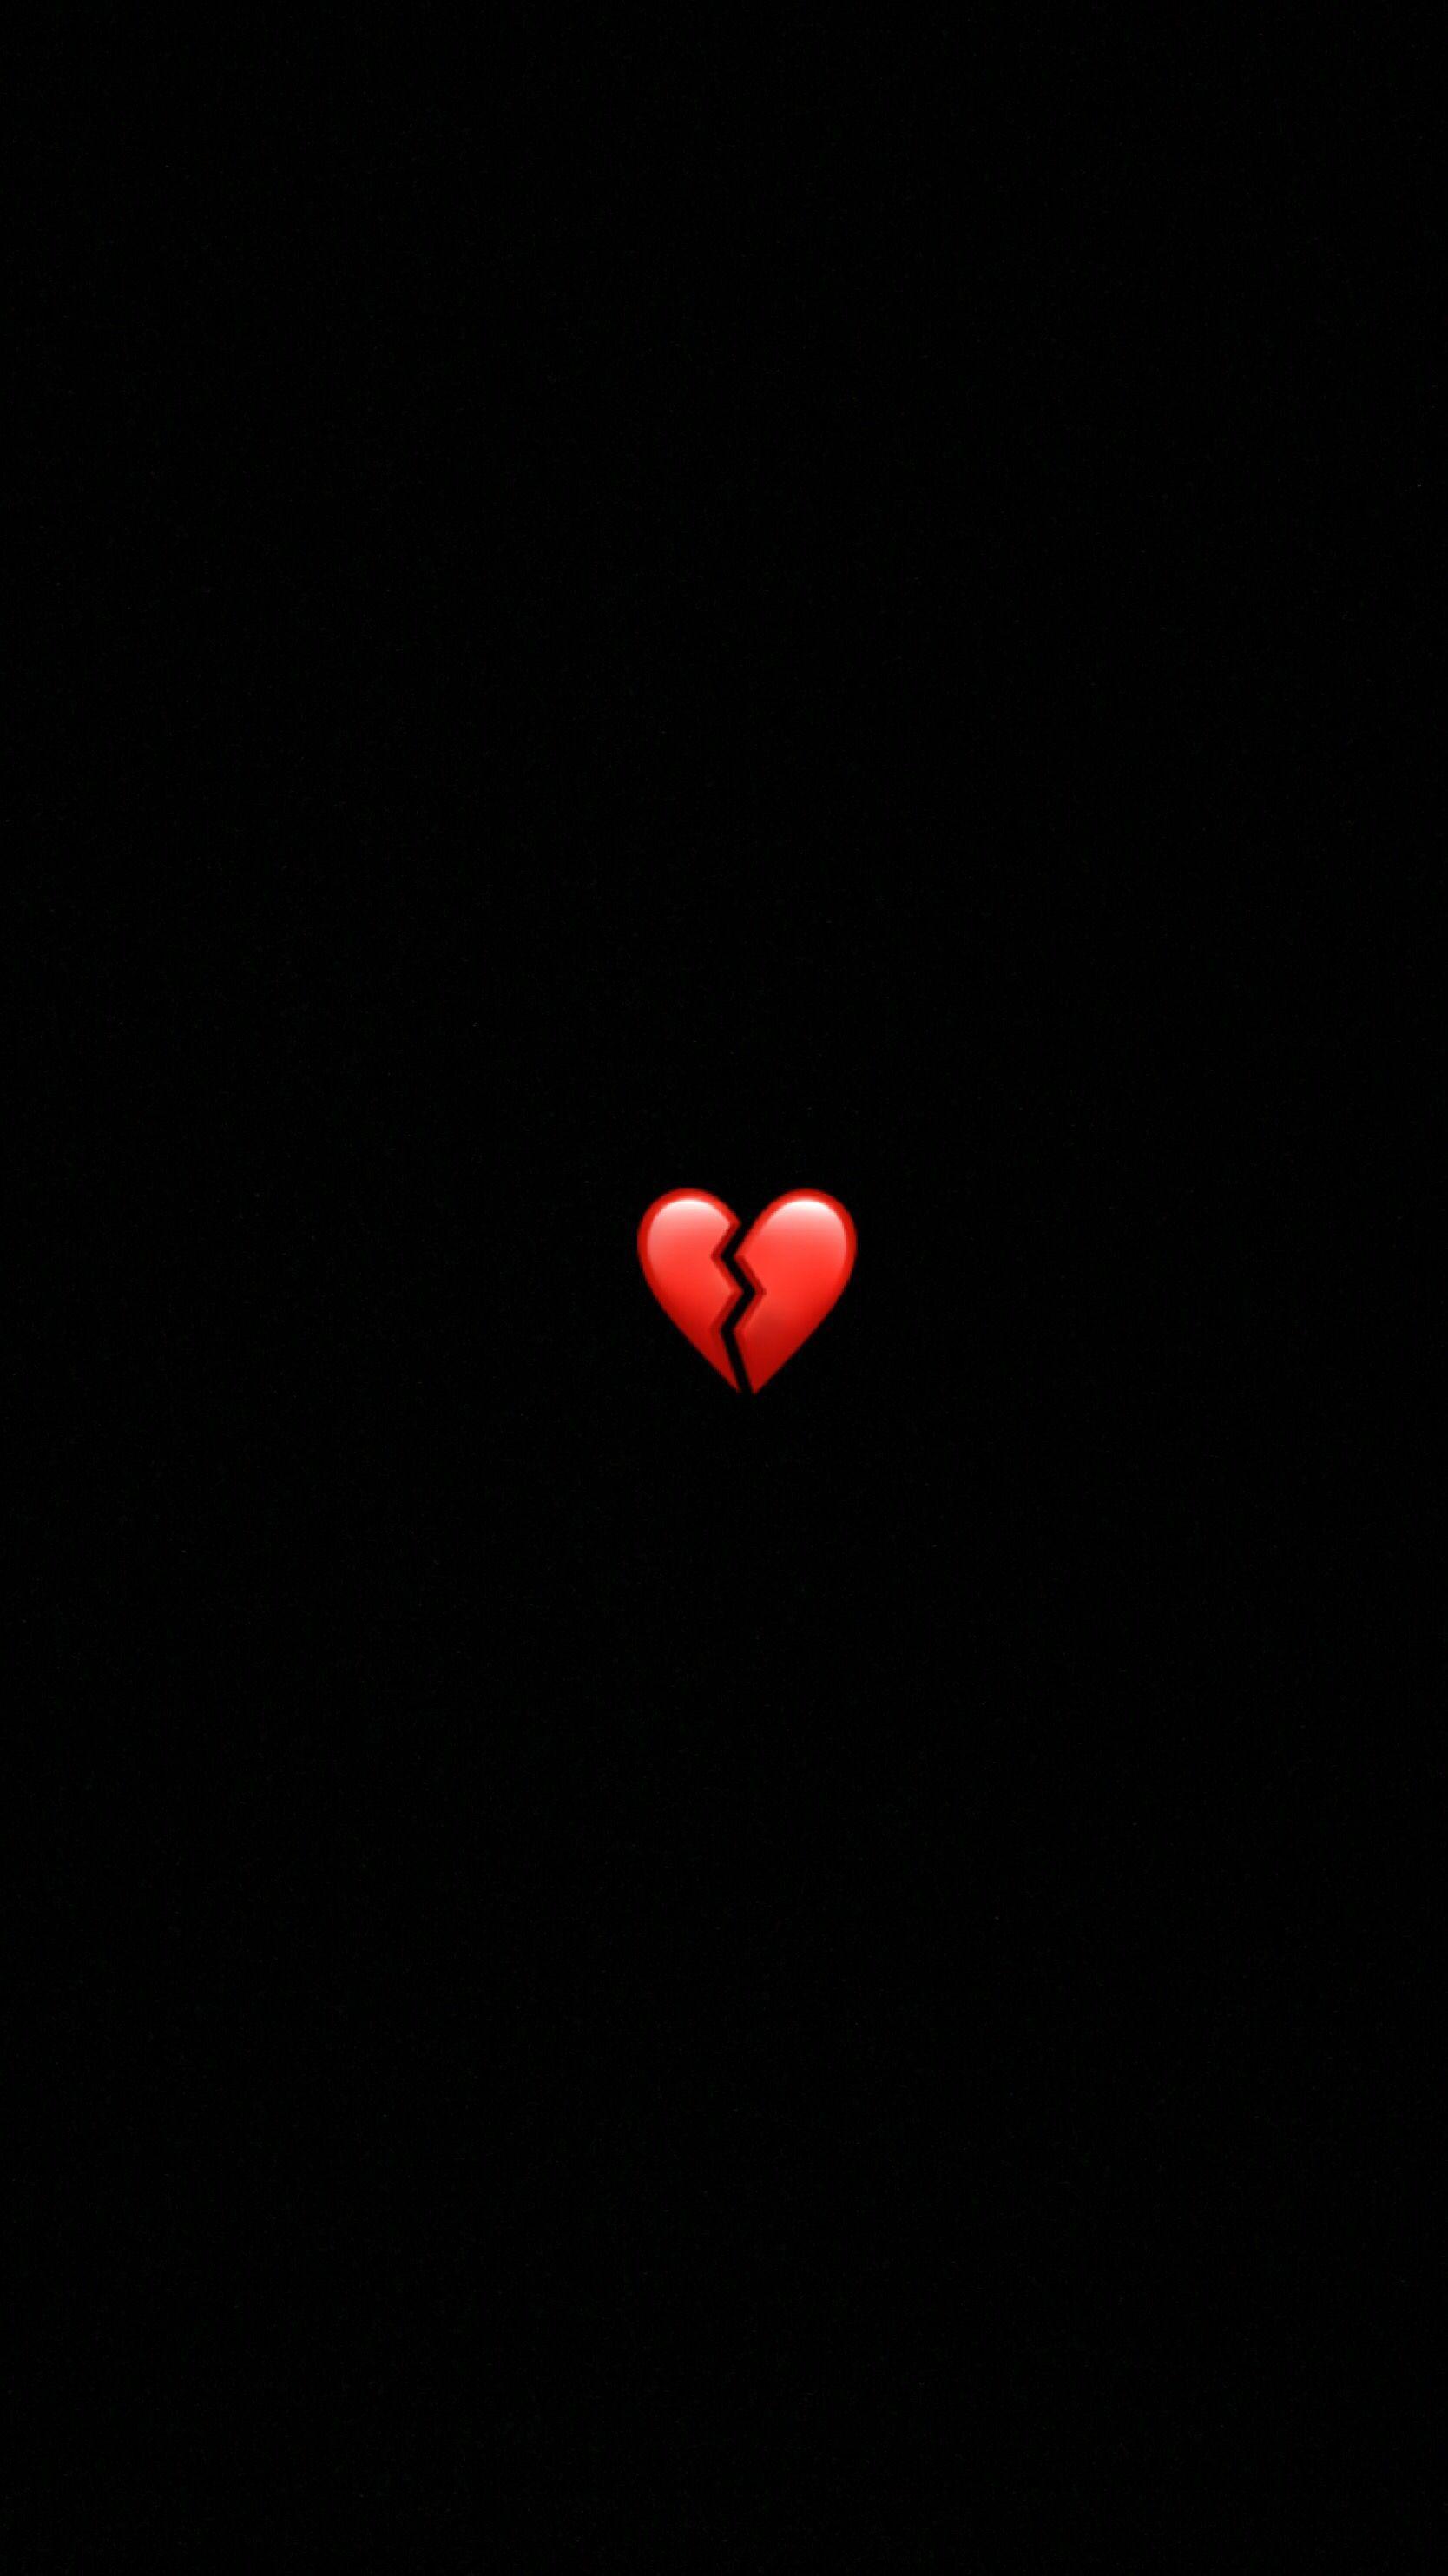 Broken Heart Wallpaper Emo